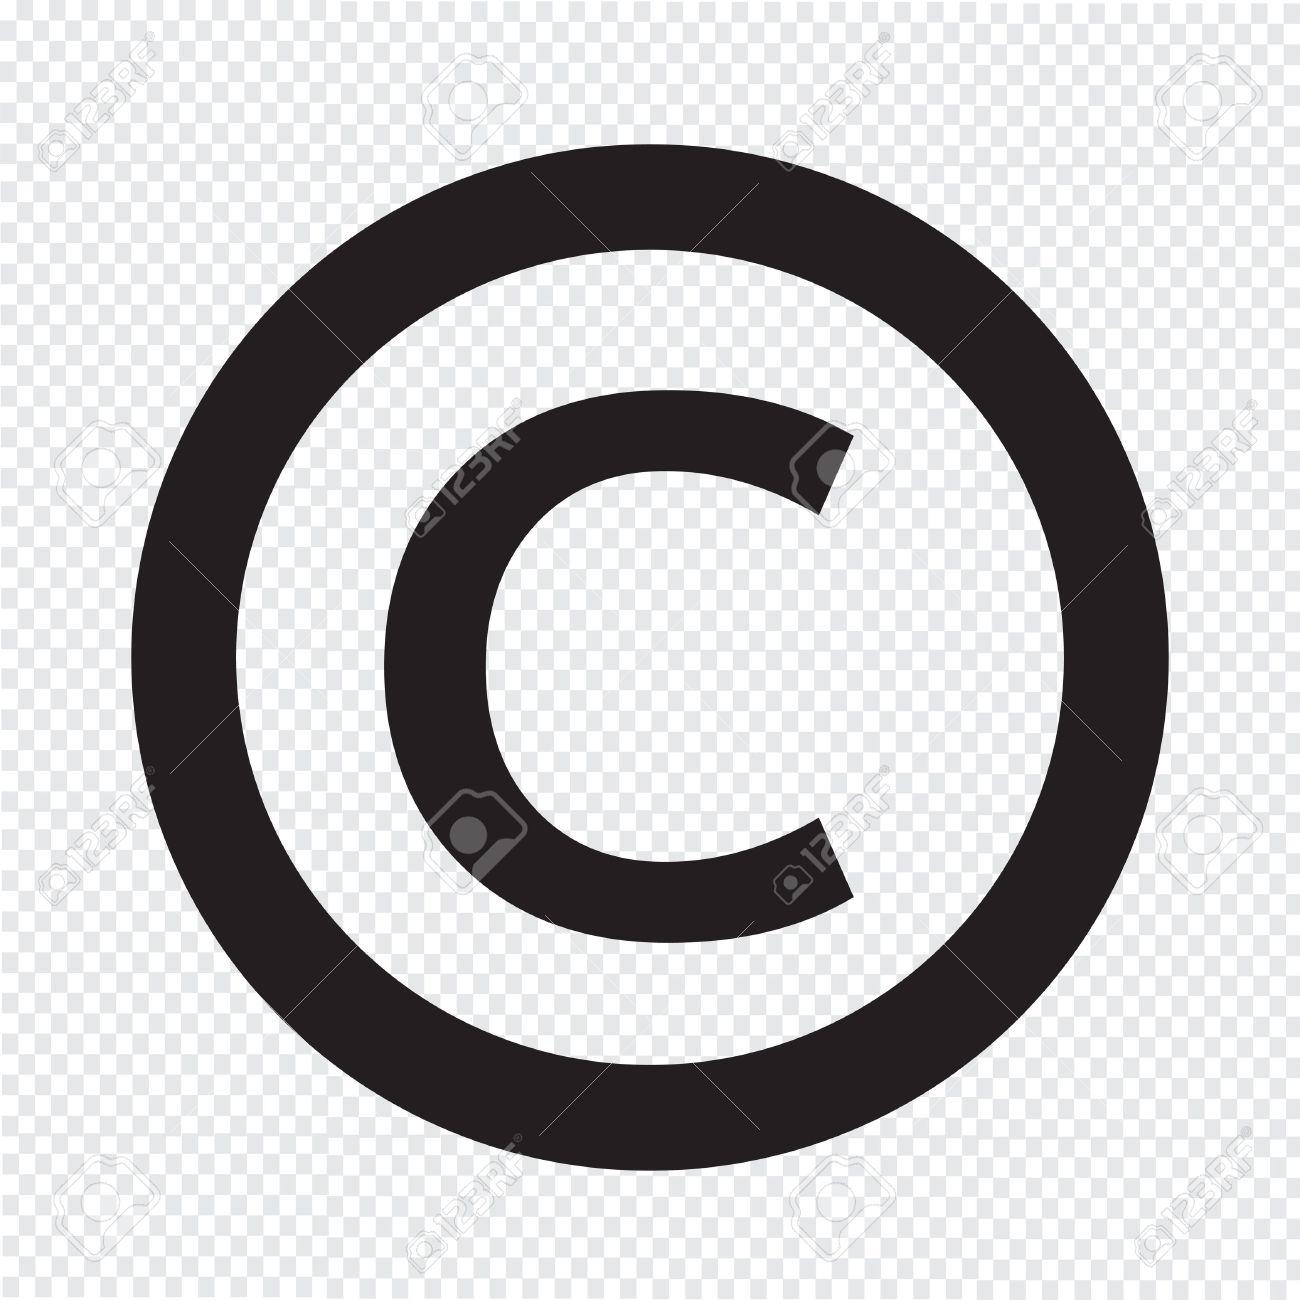 Copyright symbol icon royalty free cliparts vectors and stock copyright symbol icon stock vector 46110971 biocorpaavc